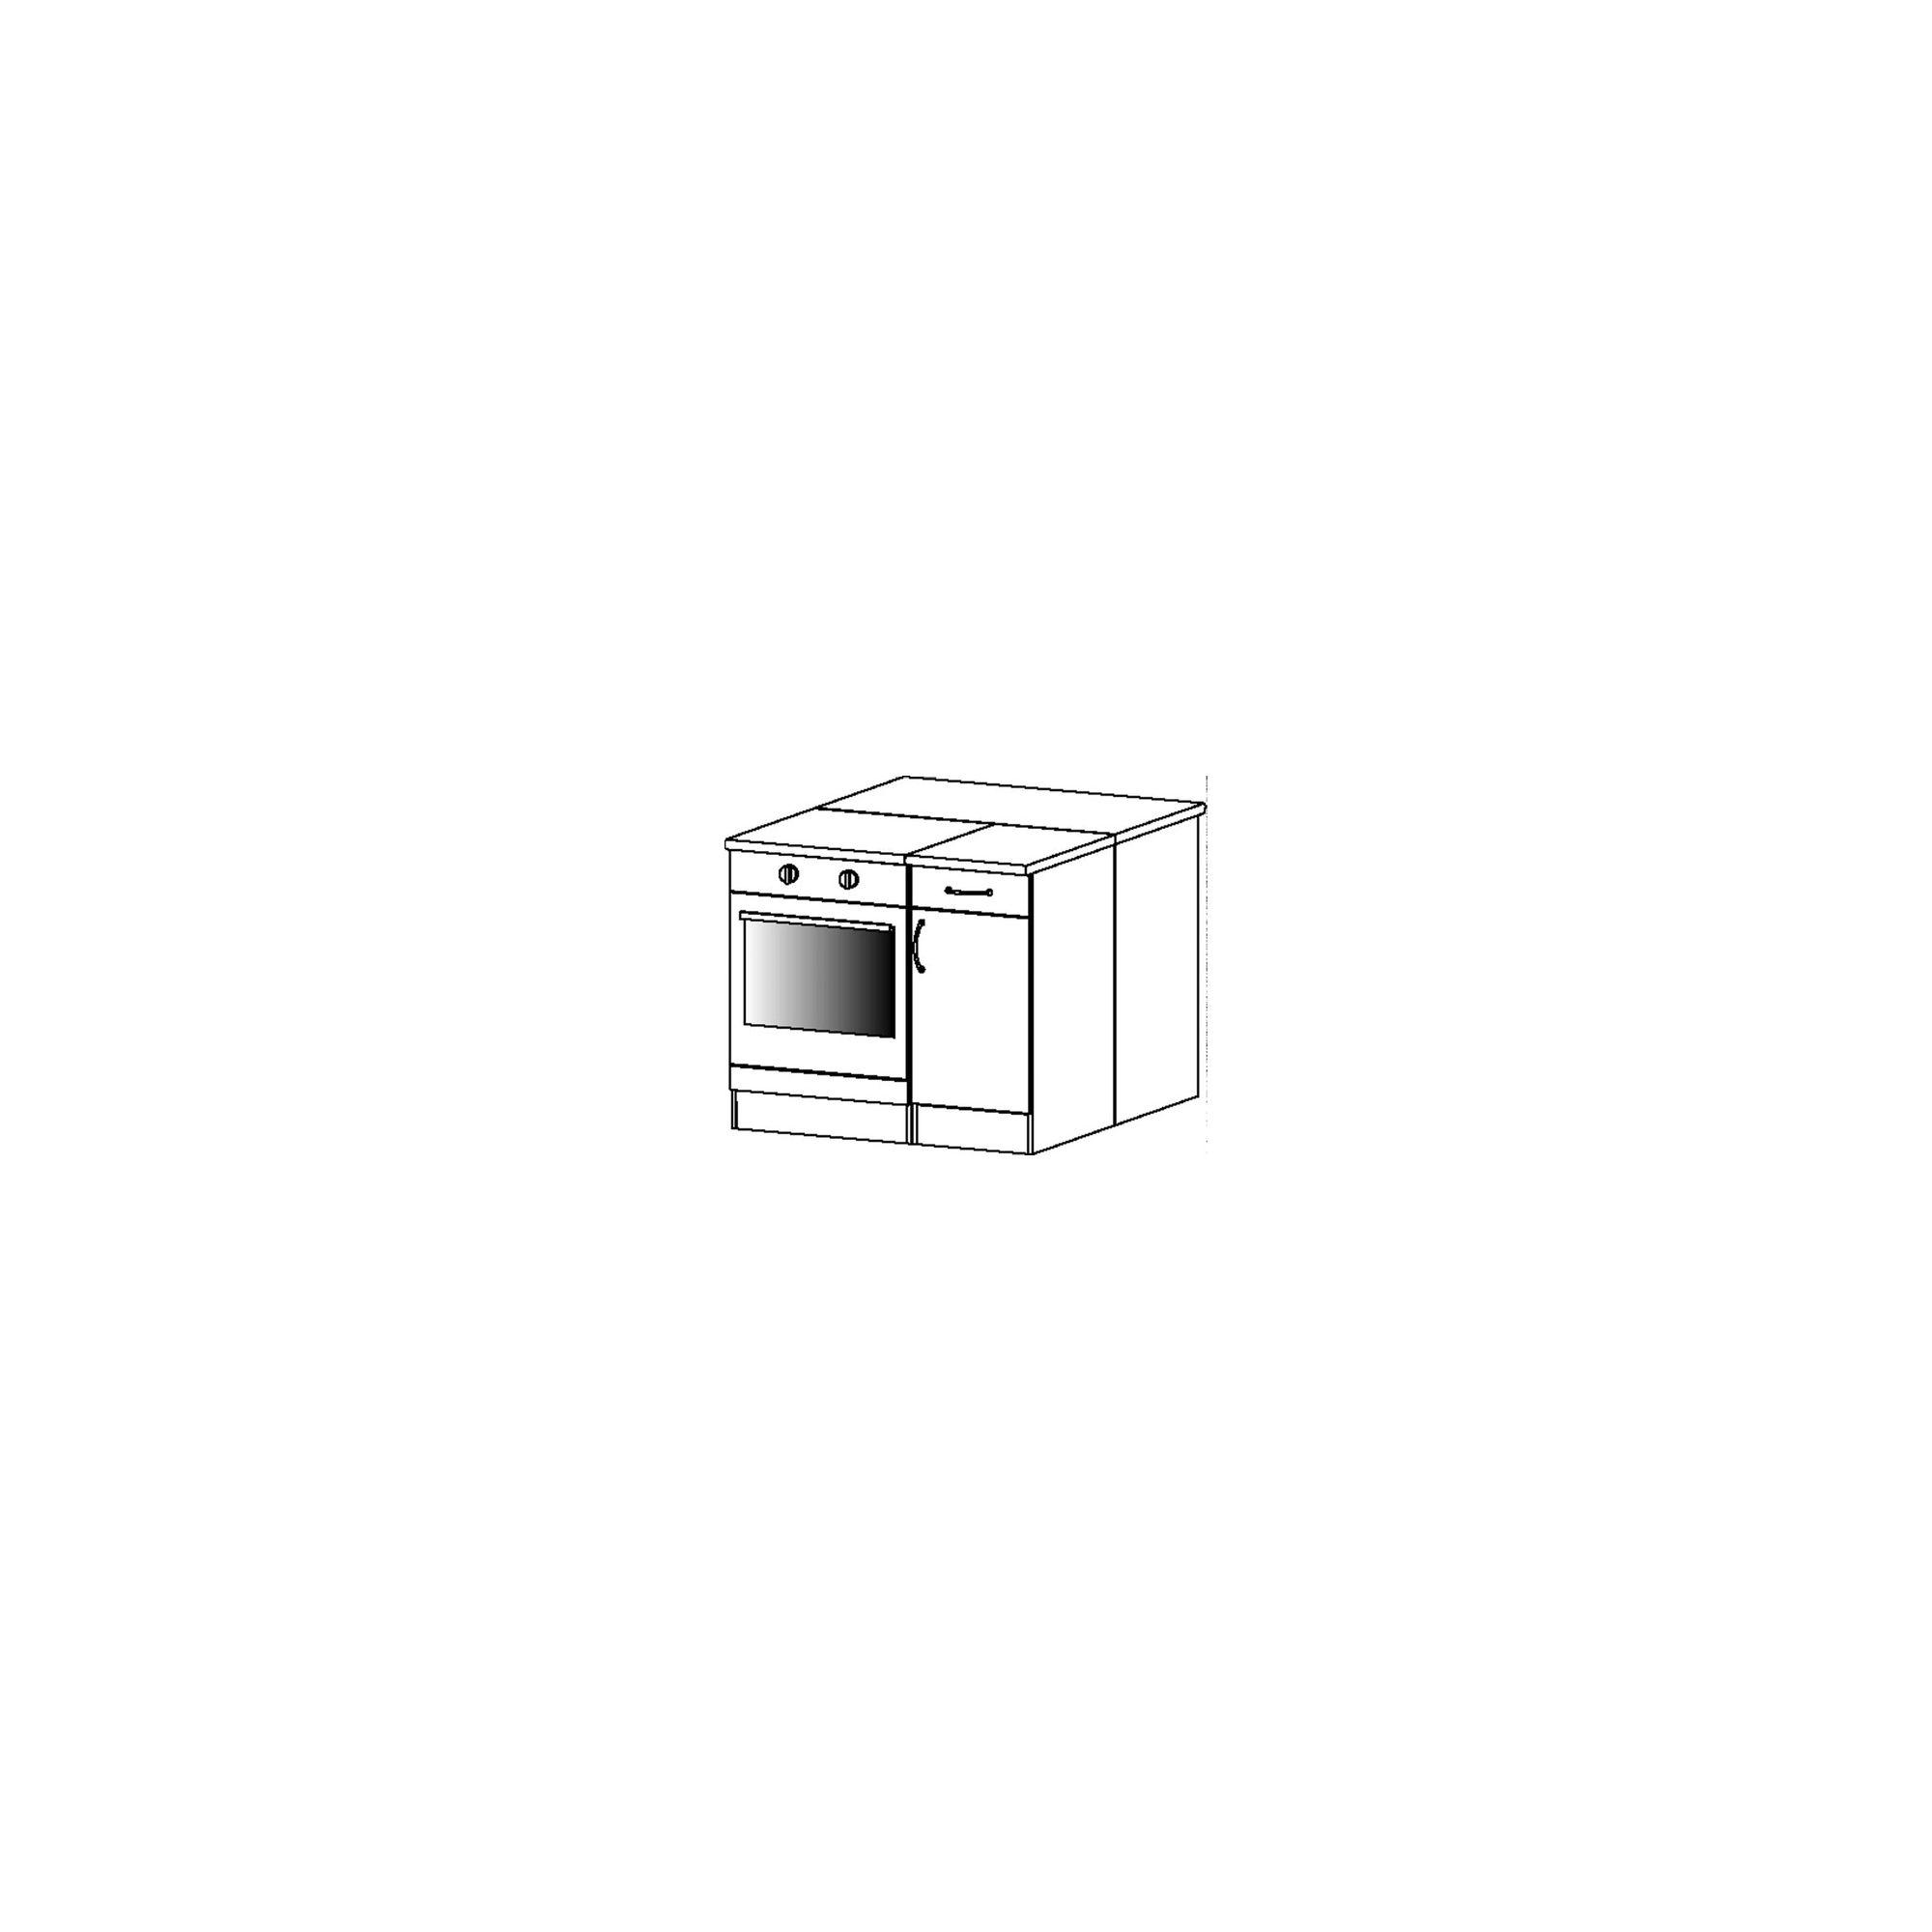 Tvilum Minima Combination 15 - Light Maple at Tesco Direct